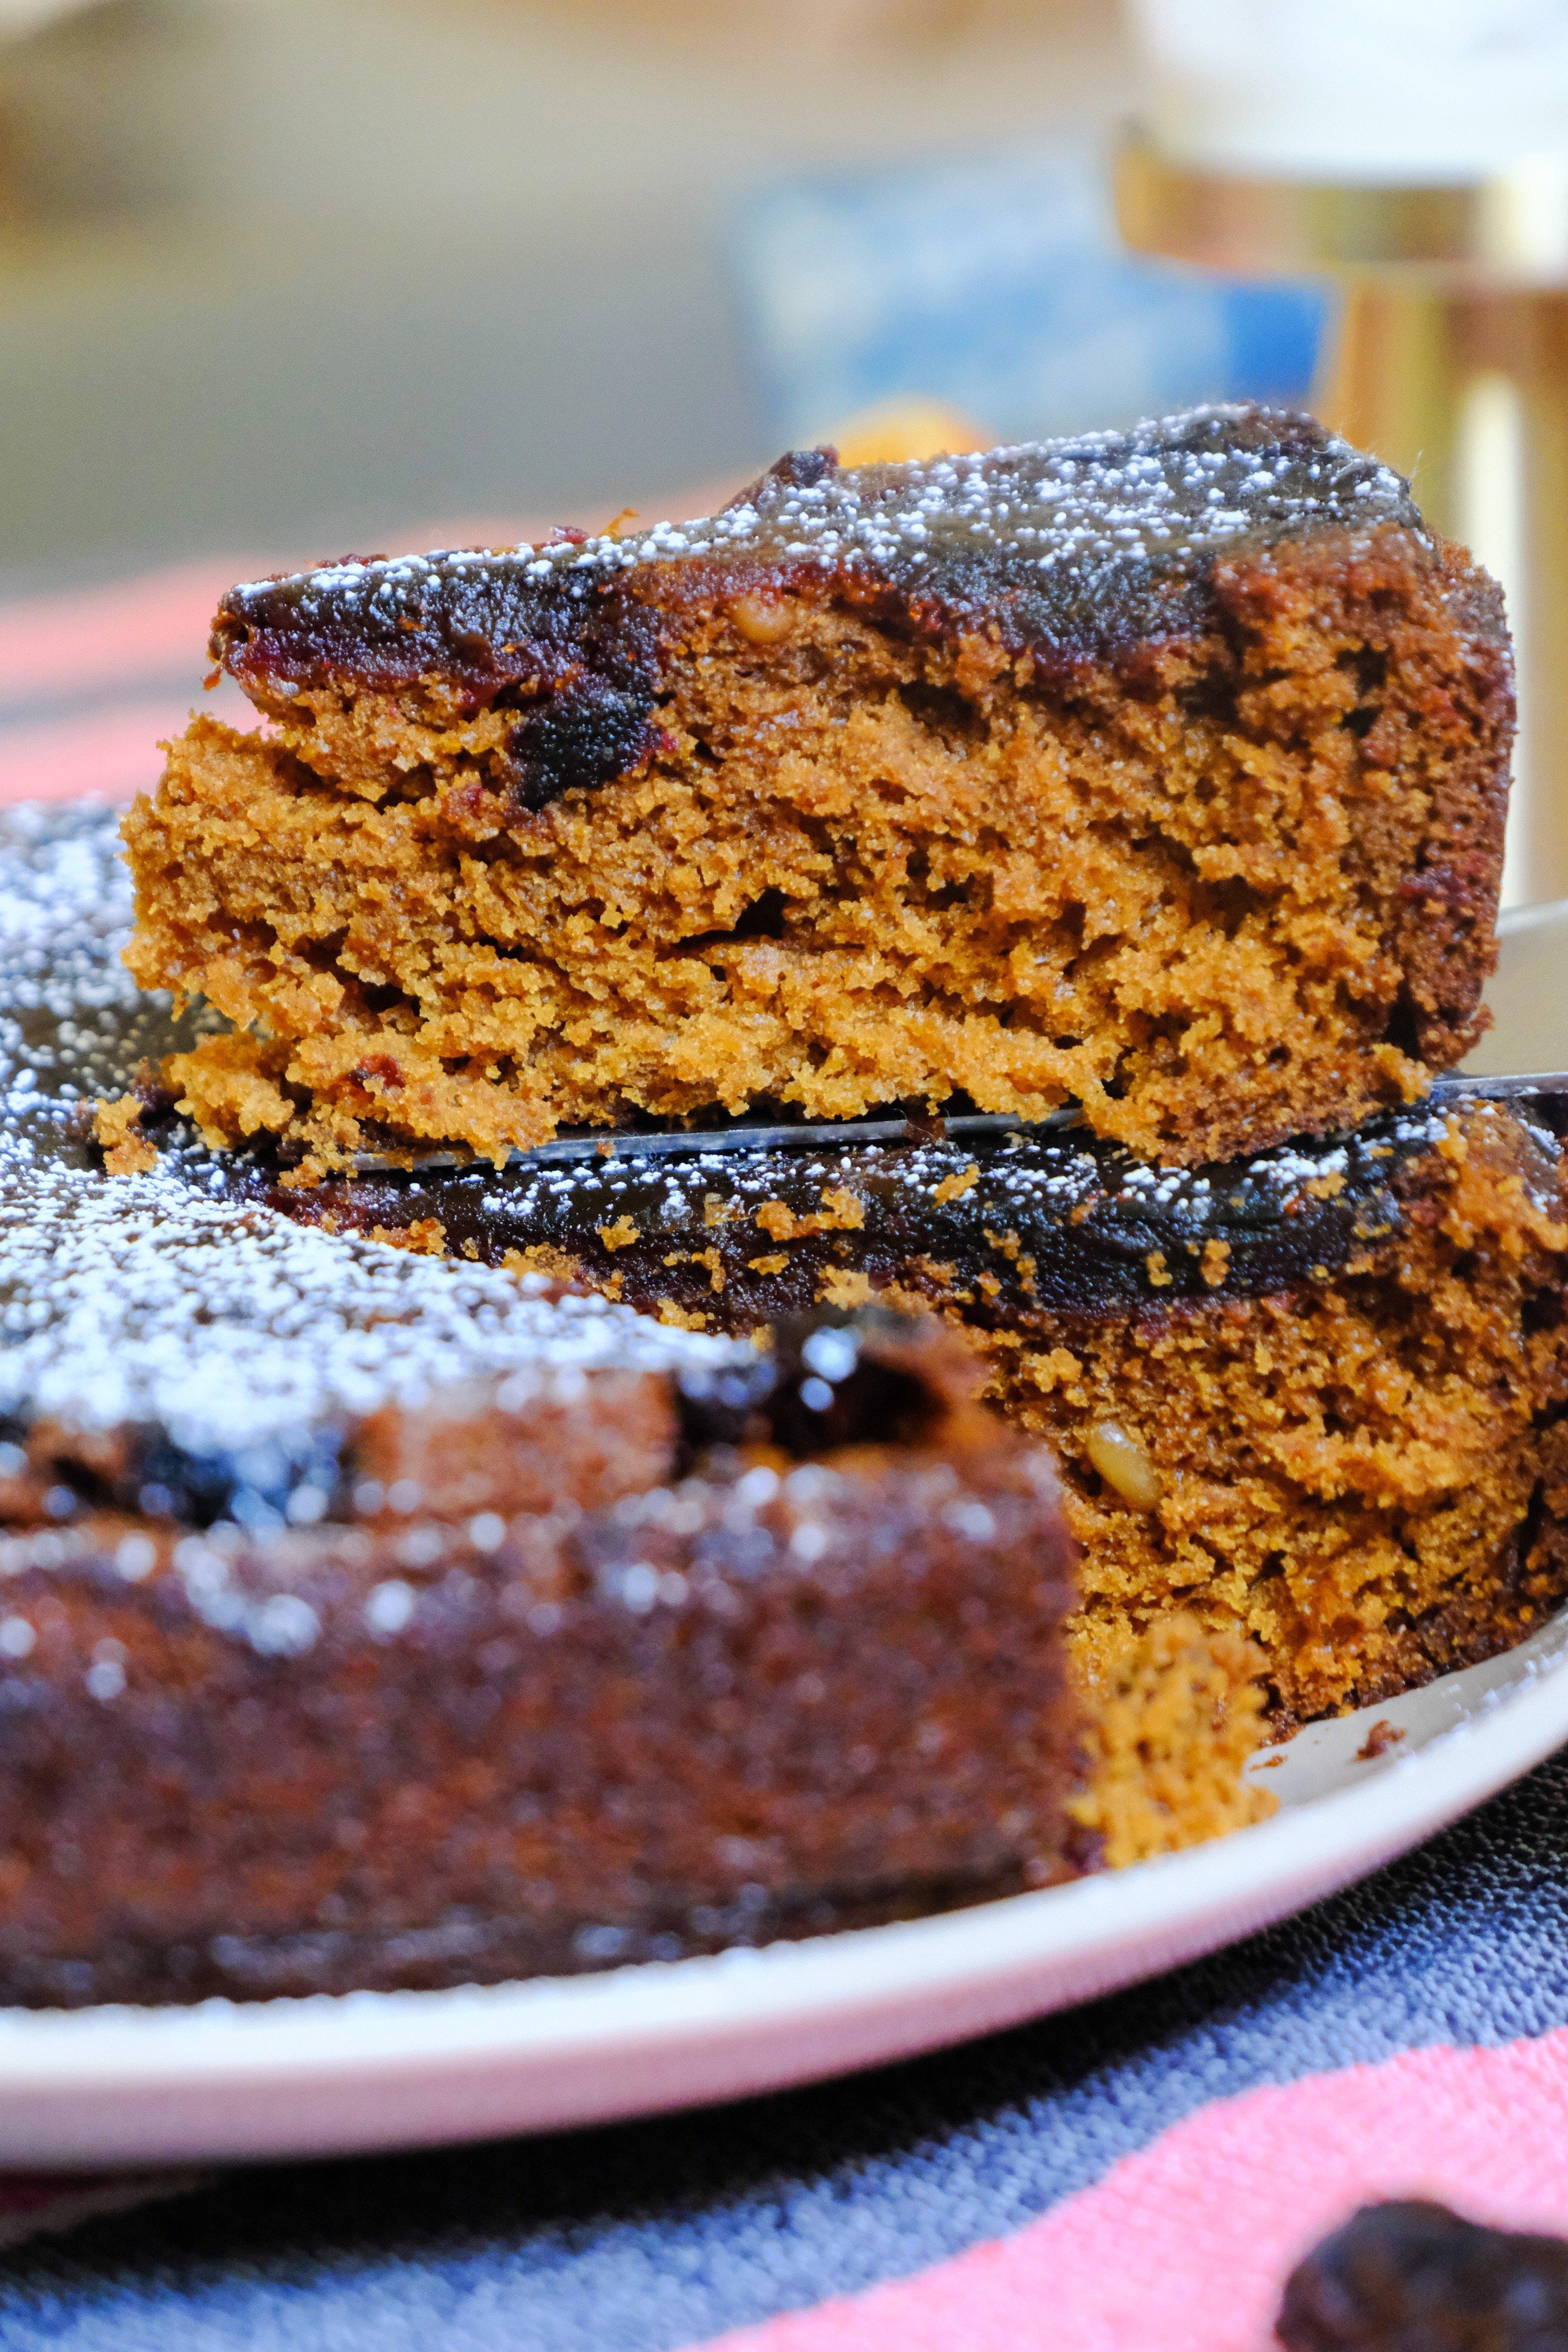 Date Olive Oil Upside Down Cake